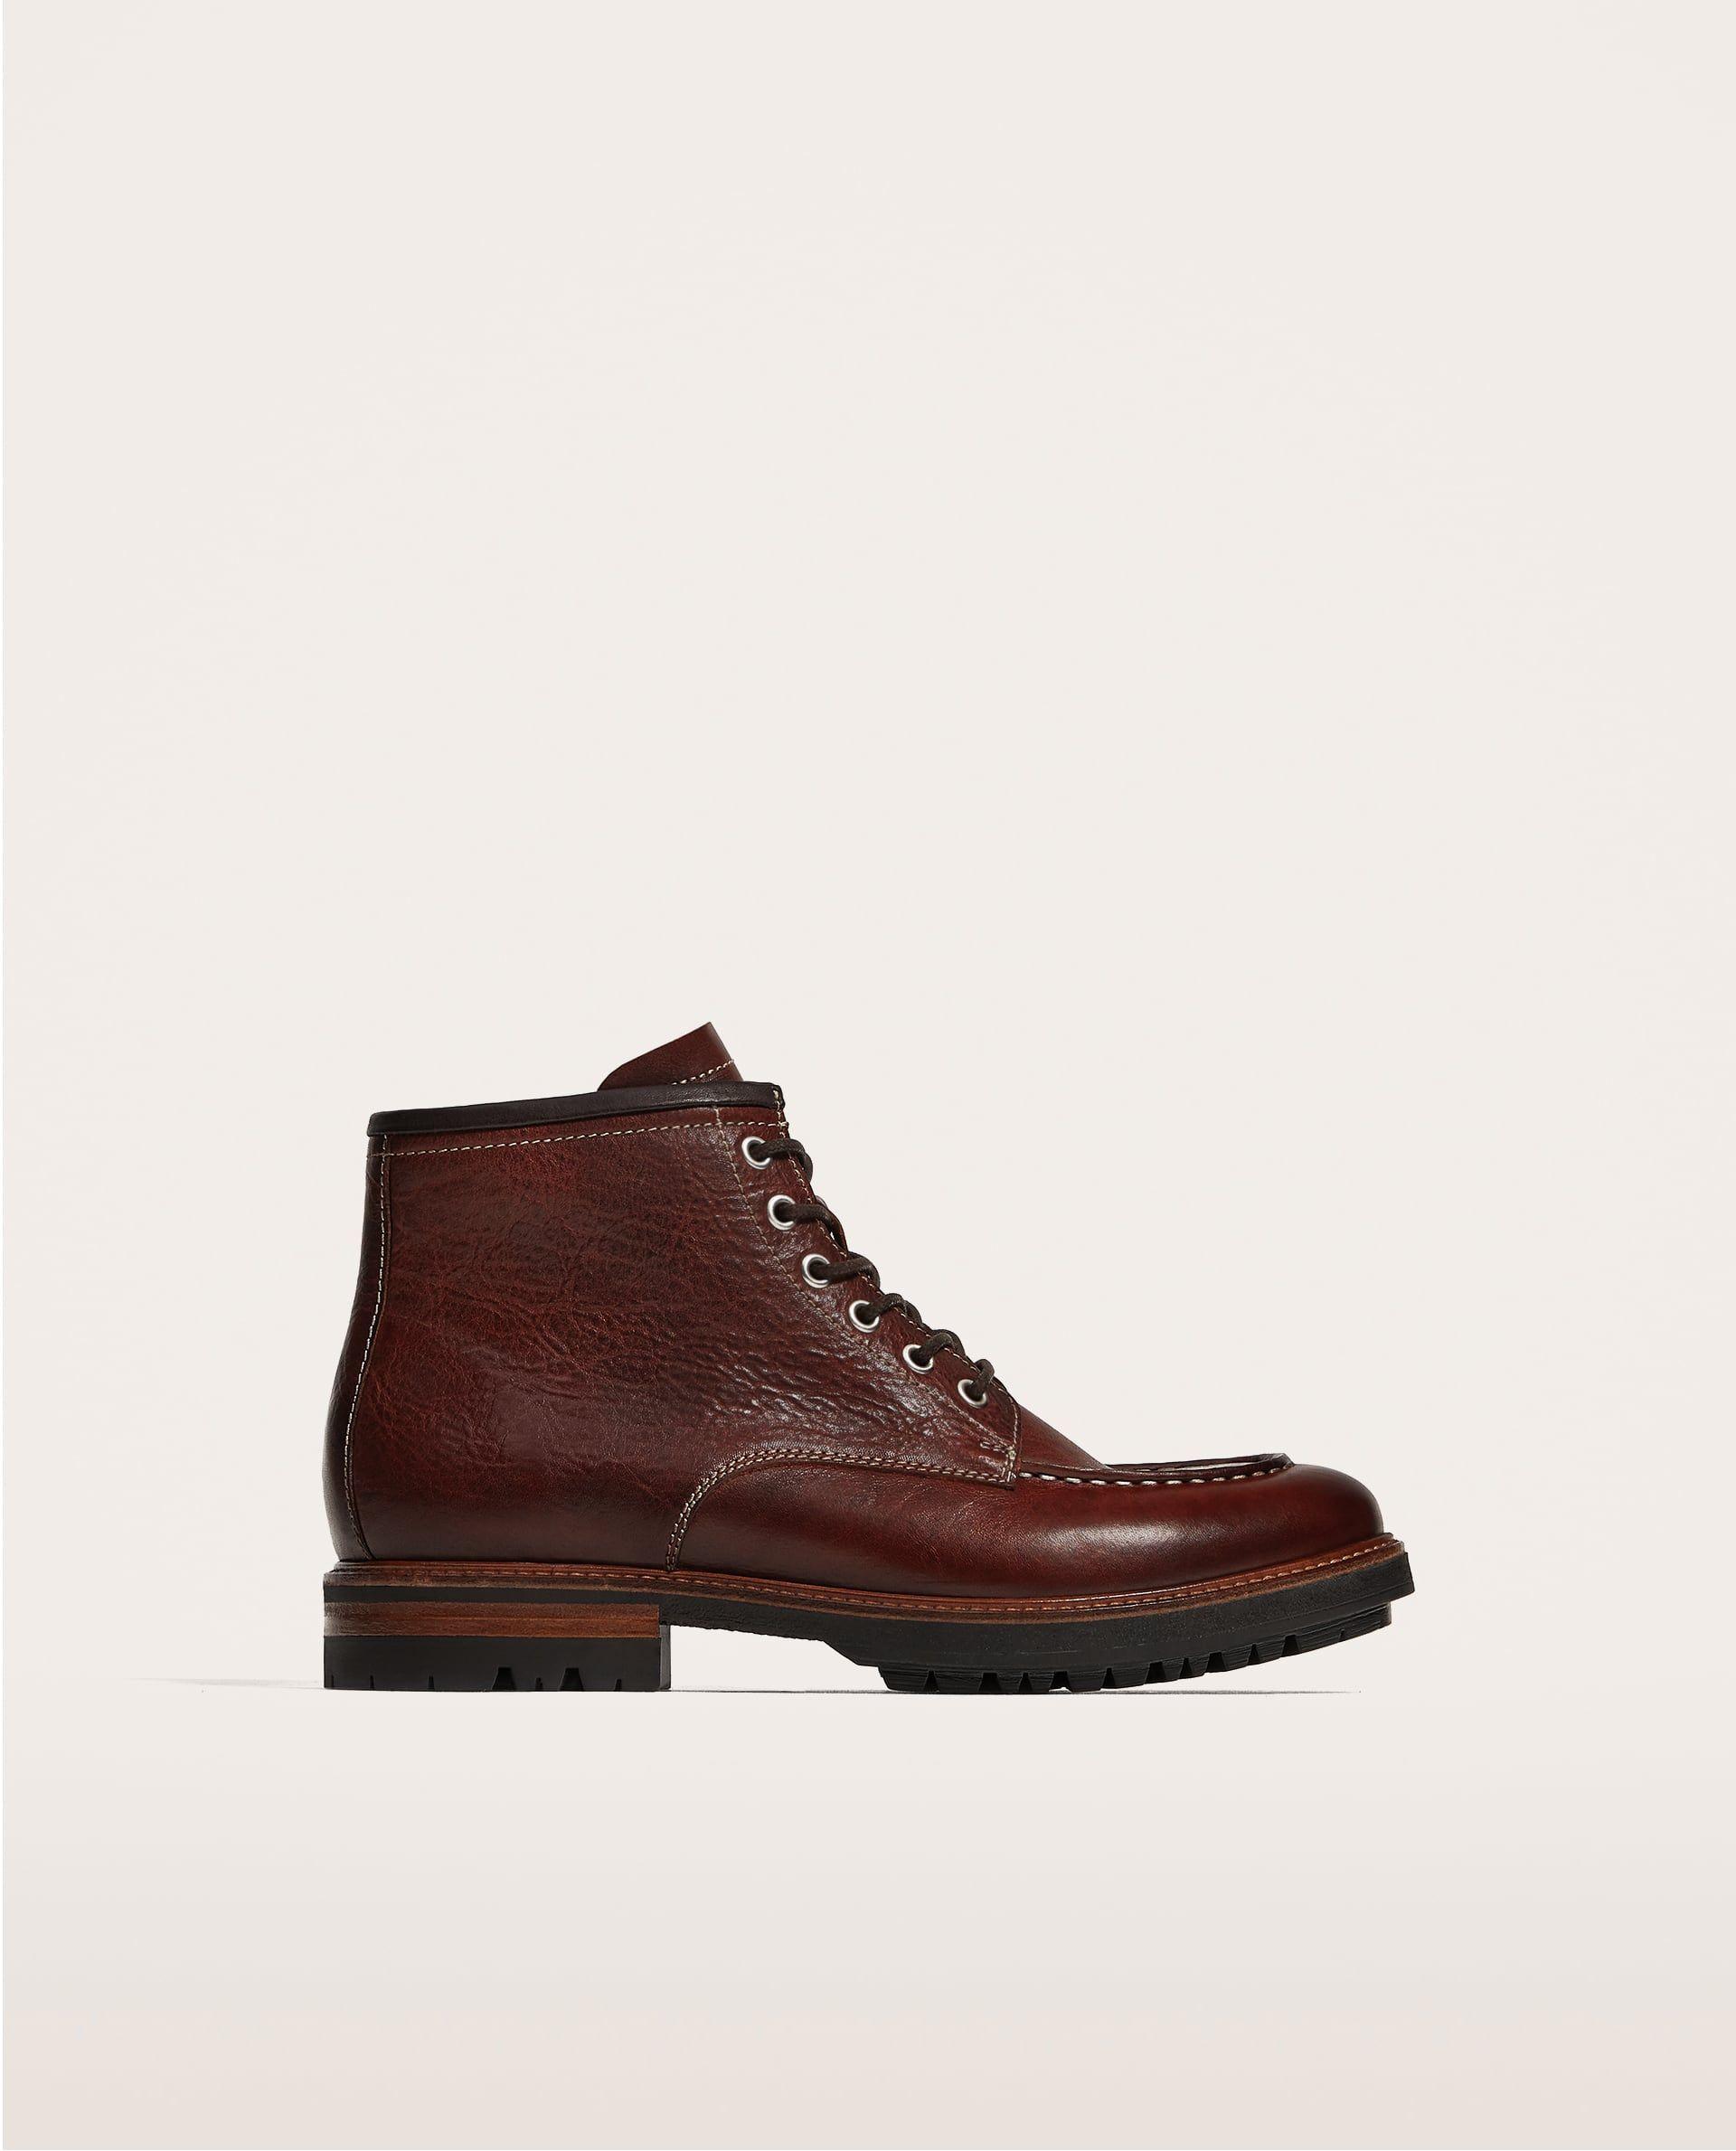 a2461db6c3 Men's Shoes | Online Sale | ZARA United Kingdom | FORMAL INSPO ...